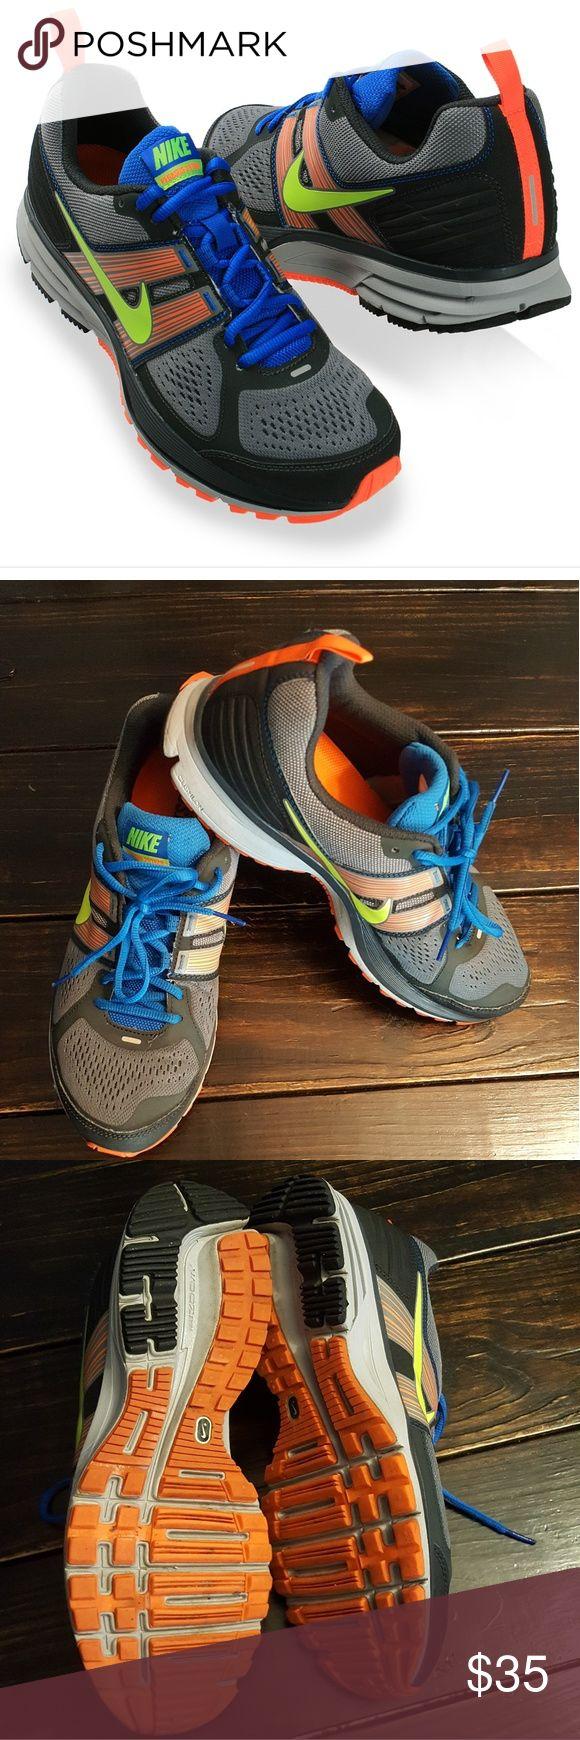 Nike Air Pegasus 29 trail good conditions Nike Shoes Athletic Shoes